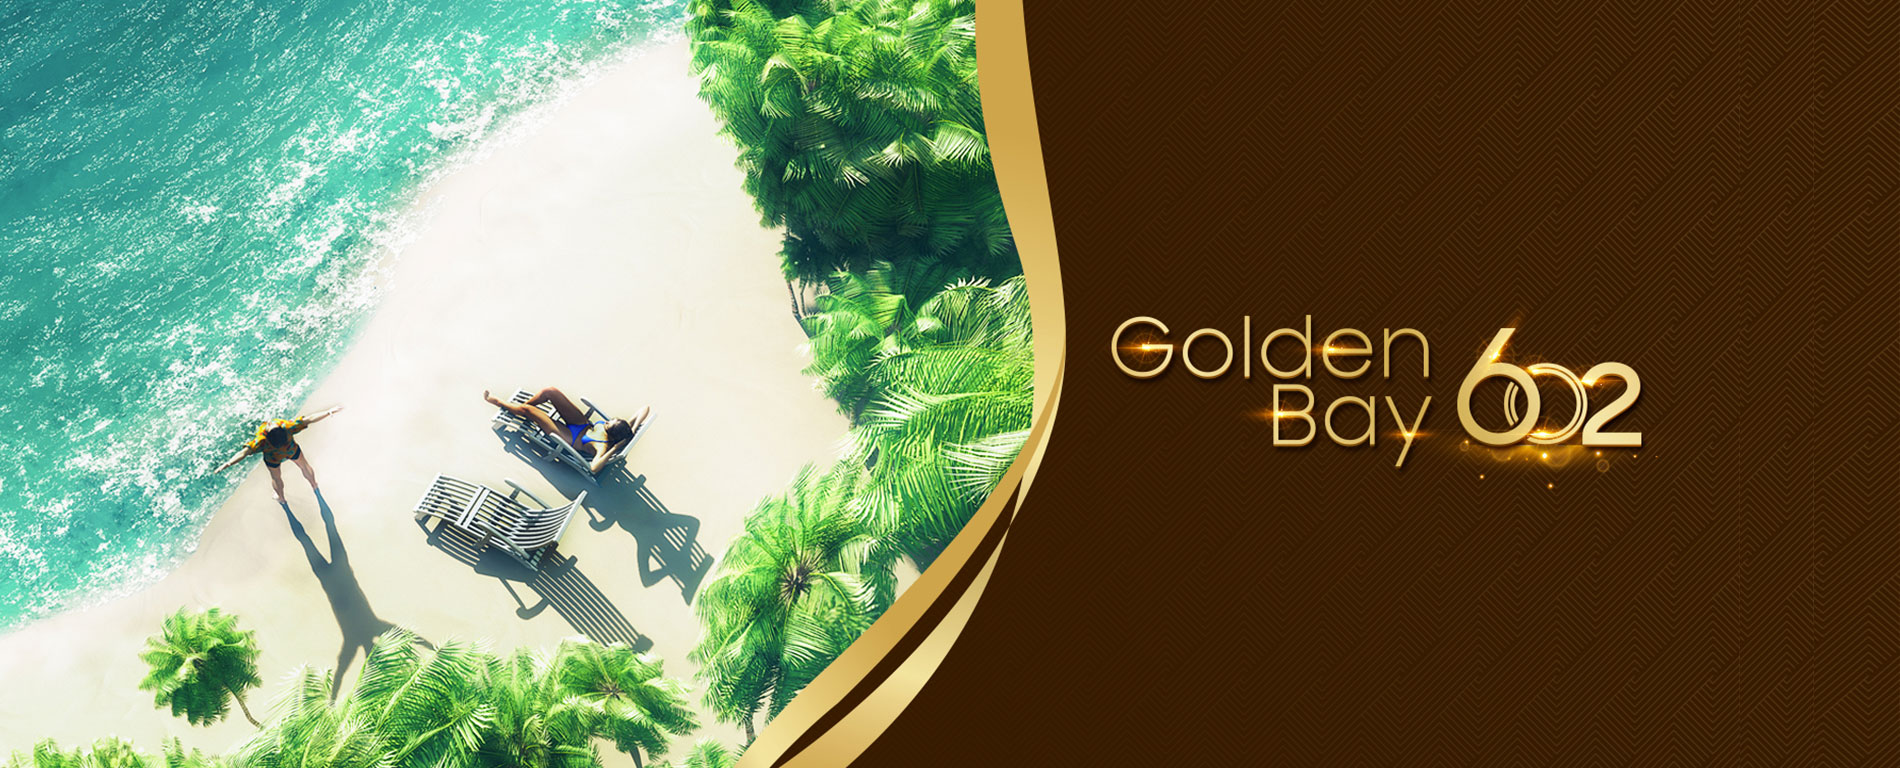 Dự án Golden Bay 602